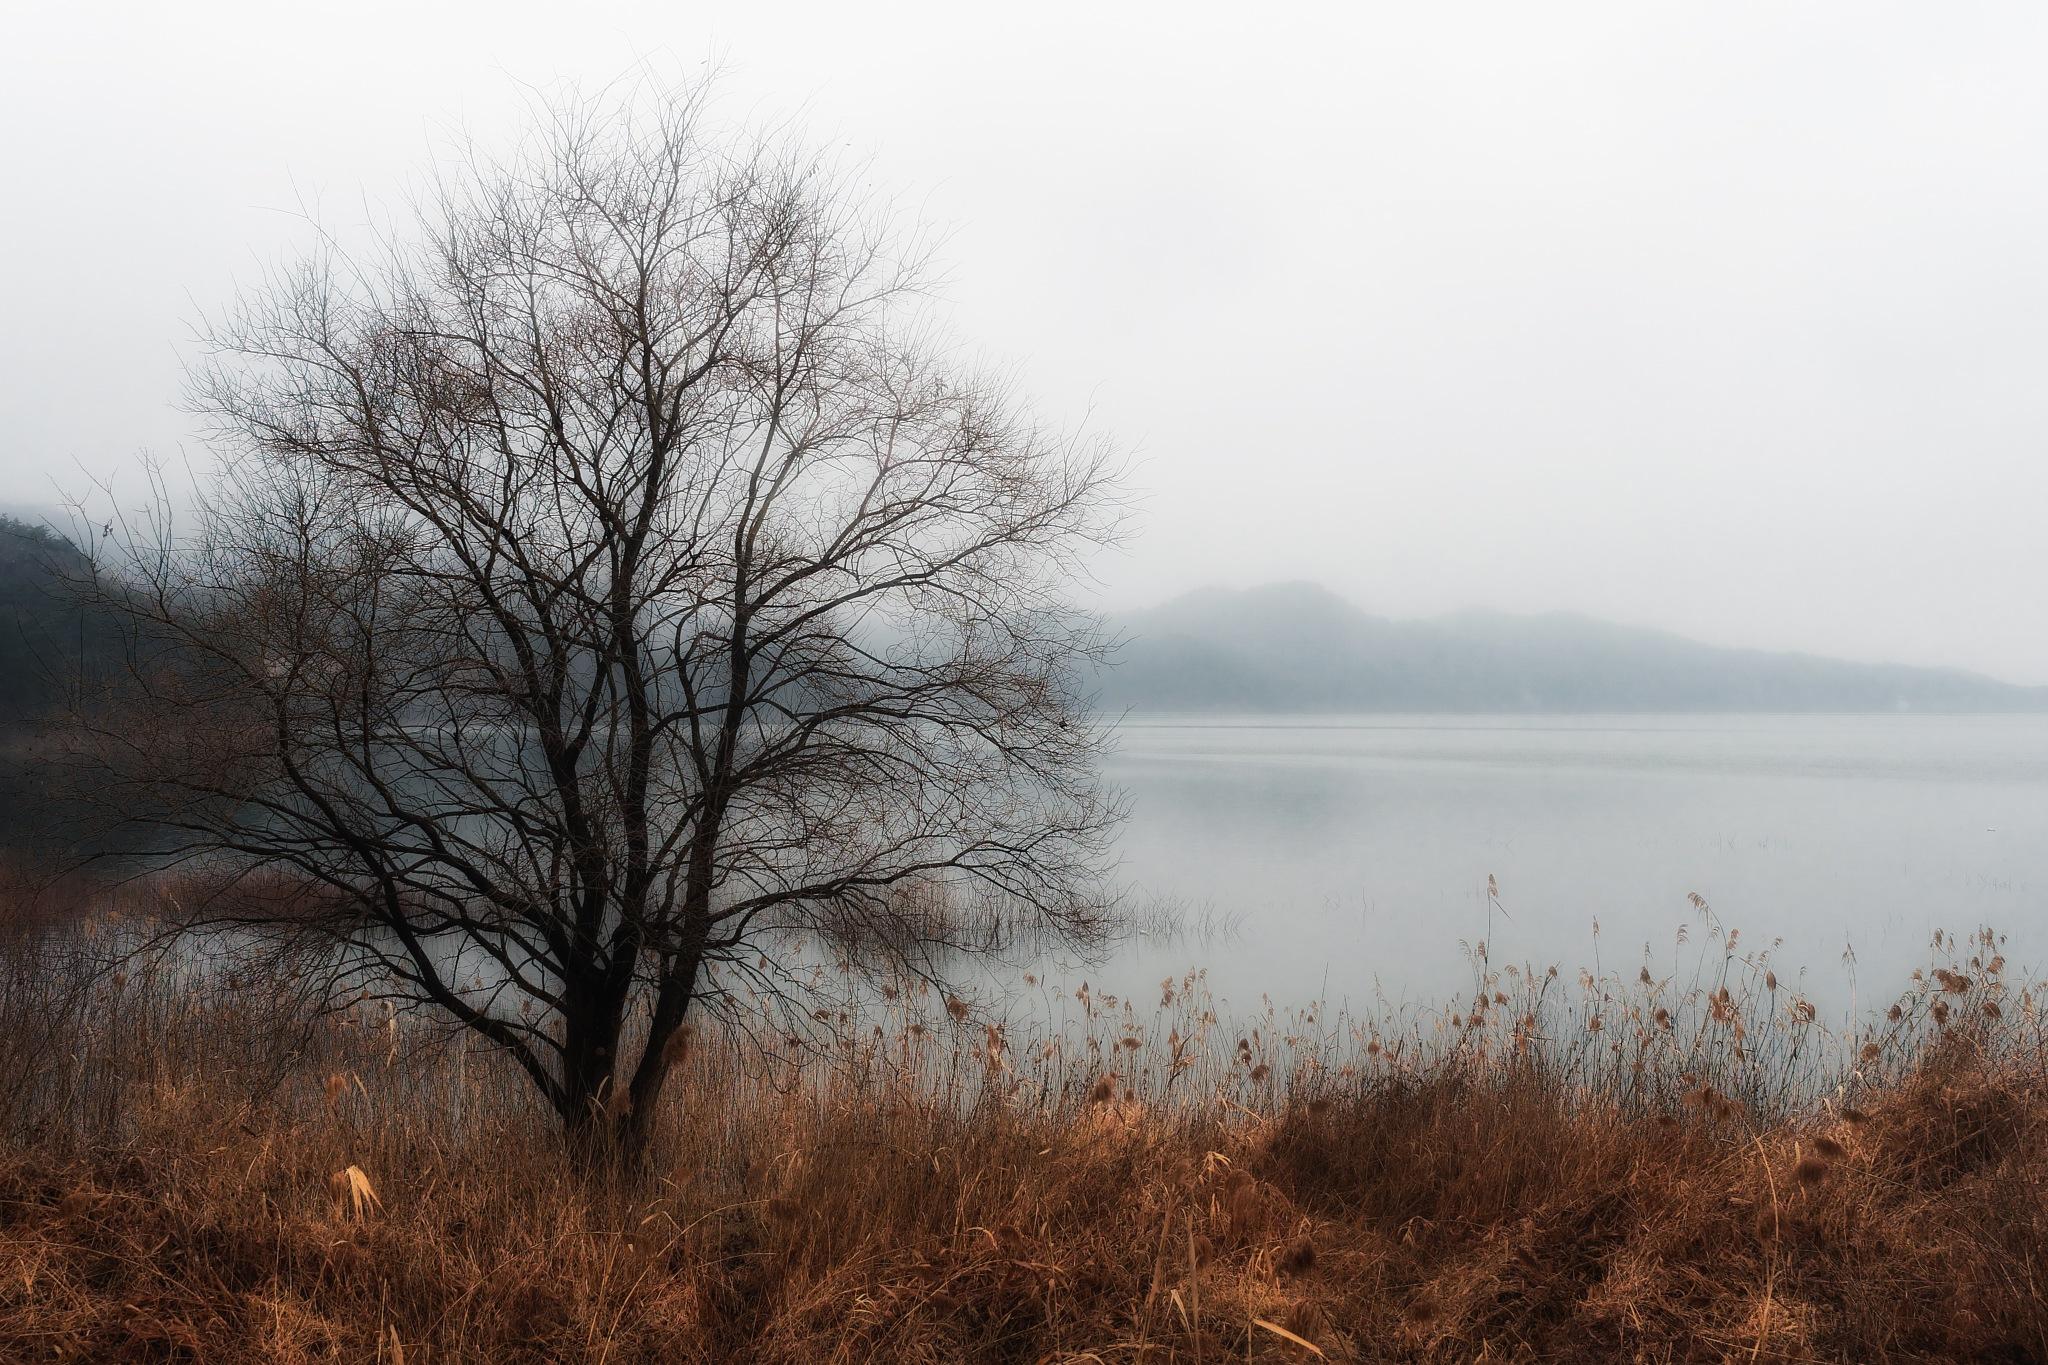 Alone by Sebastian Von Szuts